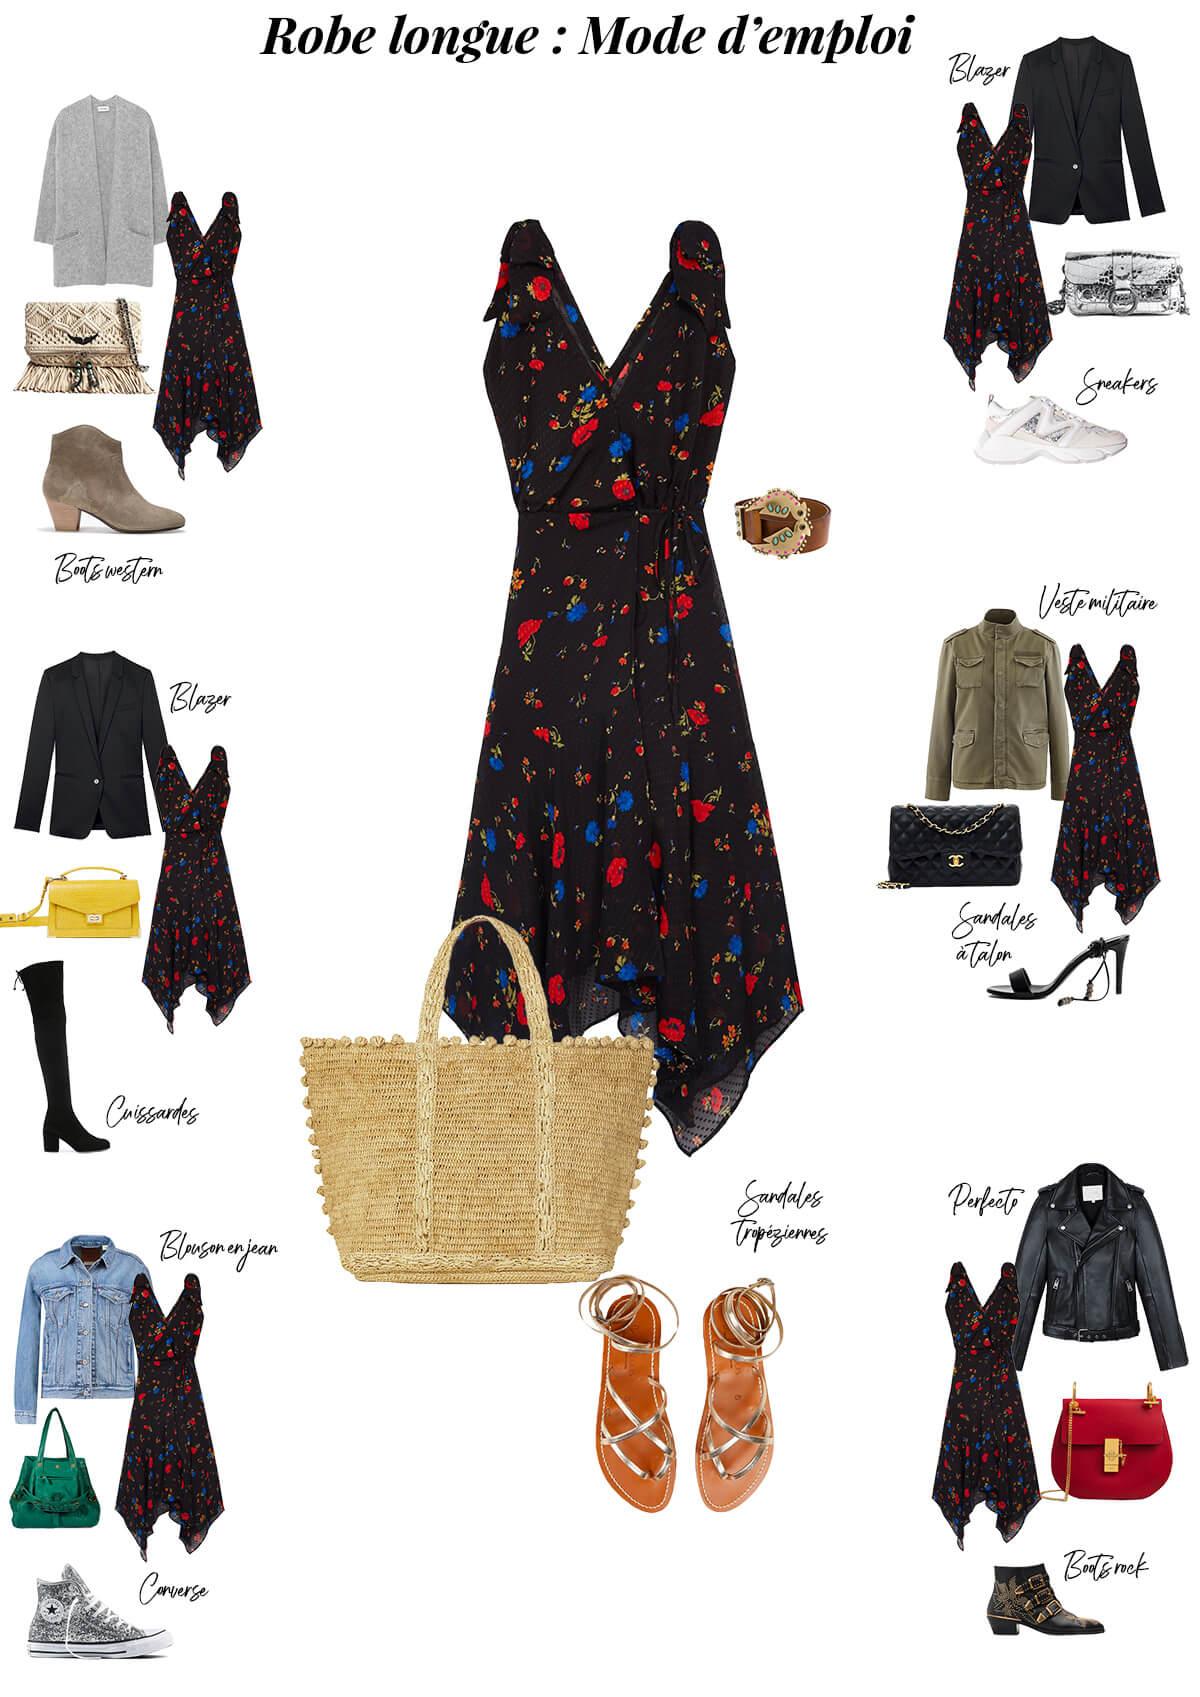 Selection soldes robe longue mode d'emploi